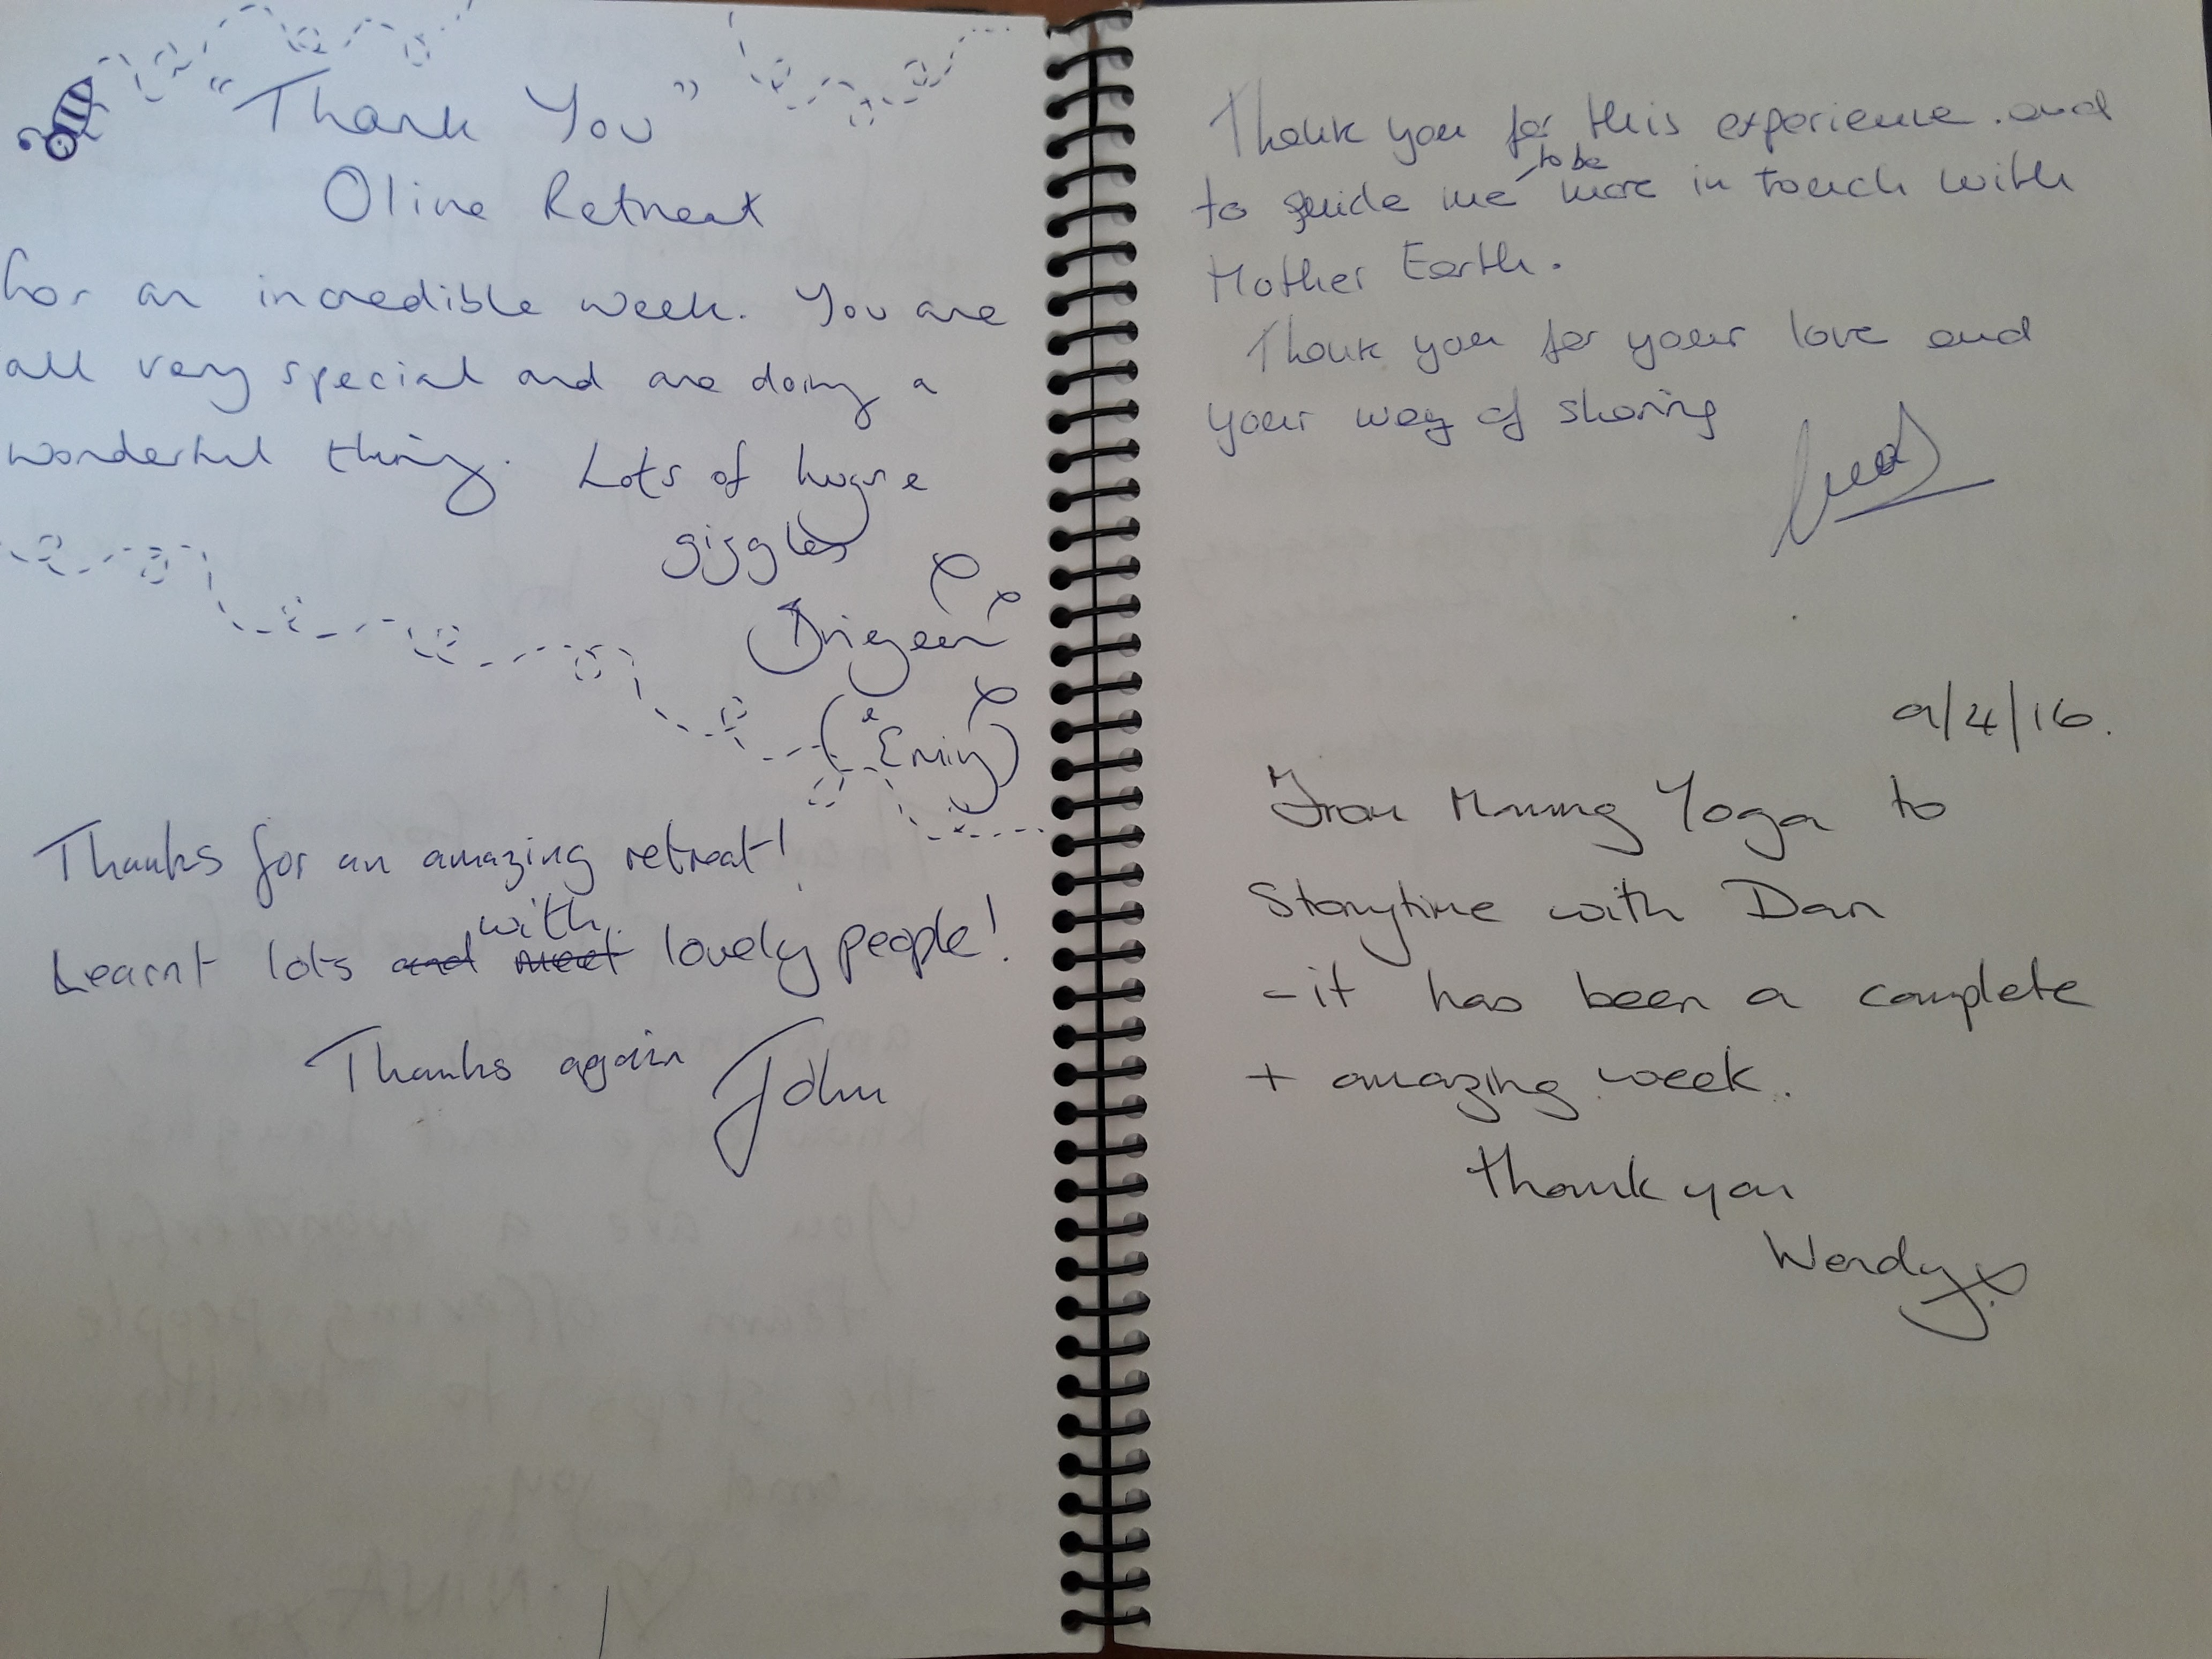 olive retreat testimonial hand written2